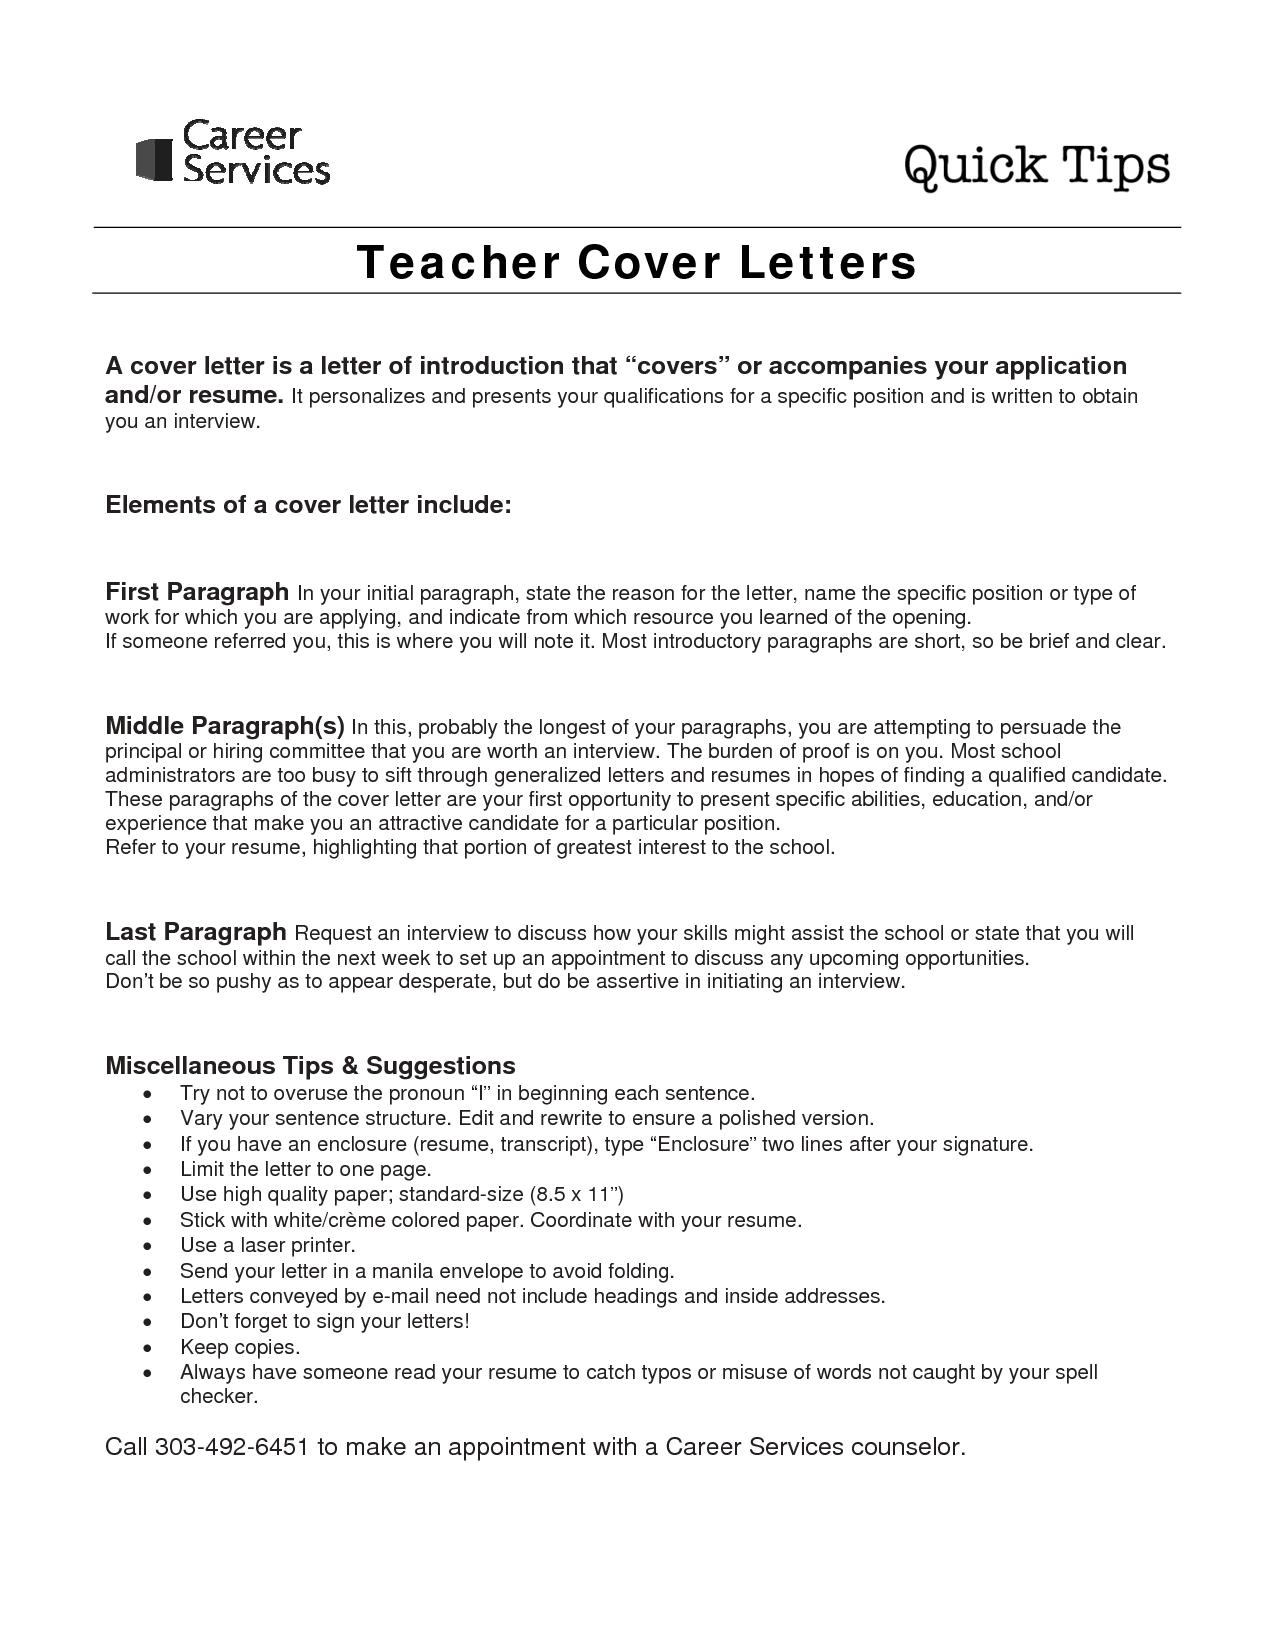 Best resume writing services for teachers job